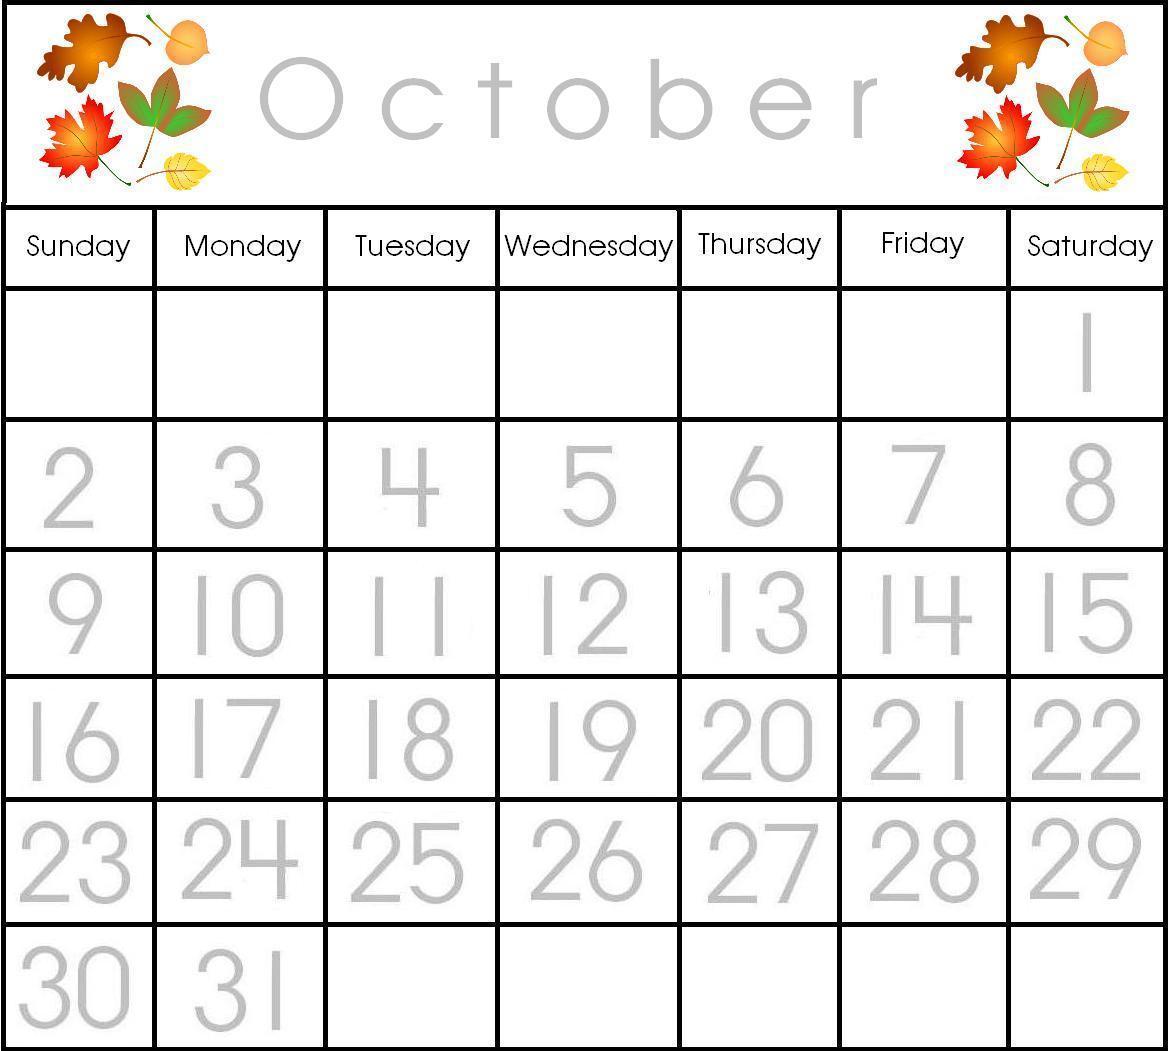 October Calendar Ideas For Preschool : Free printable preschool calendar numbers